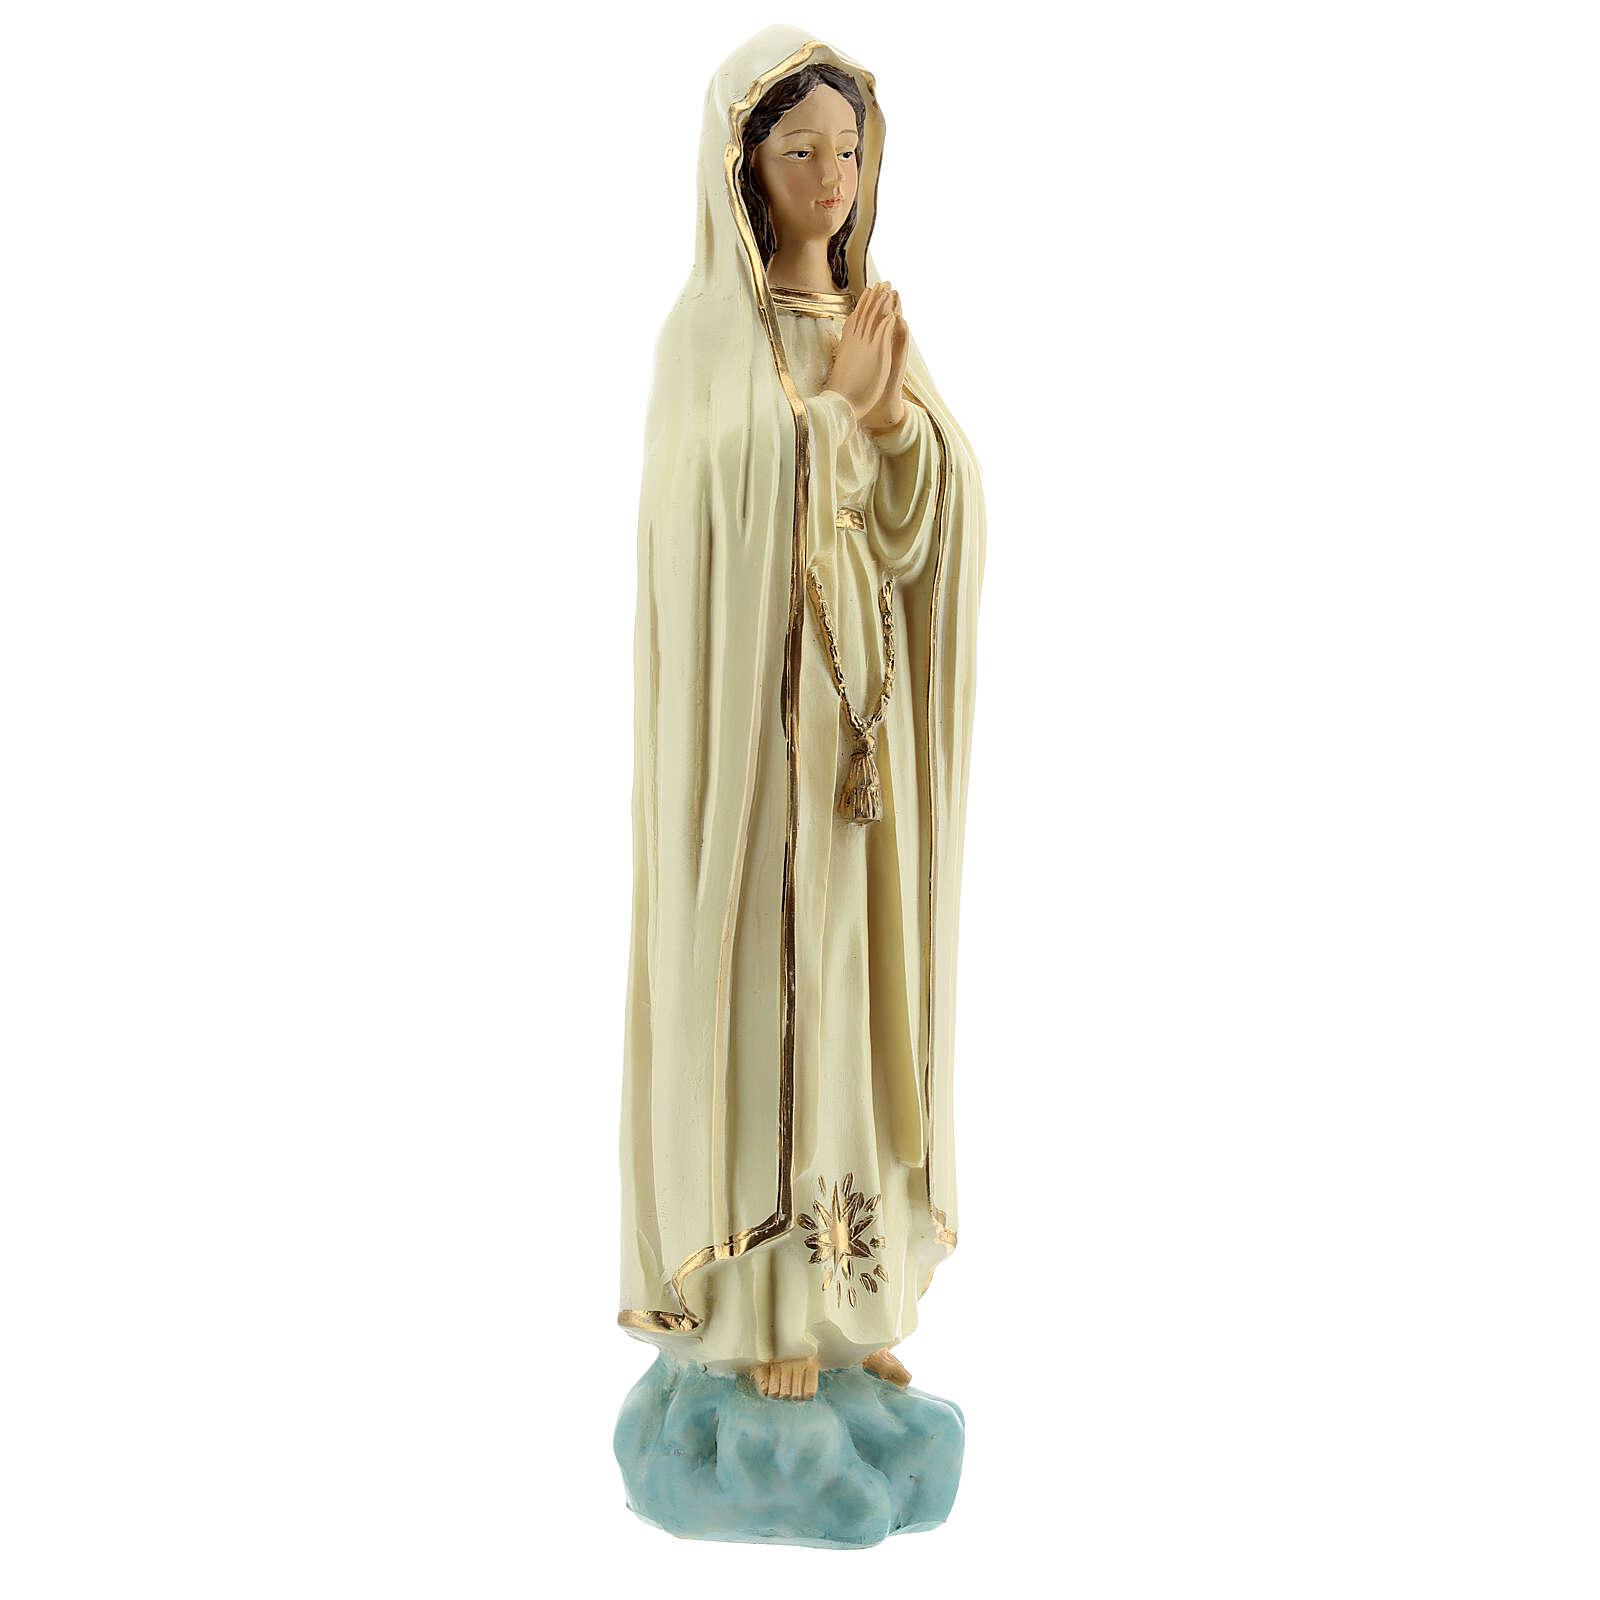 Madonna Fatima senza corona stella dorata statua resina 20 cm 4